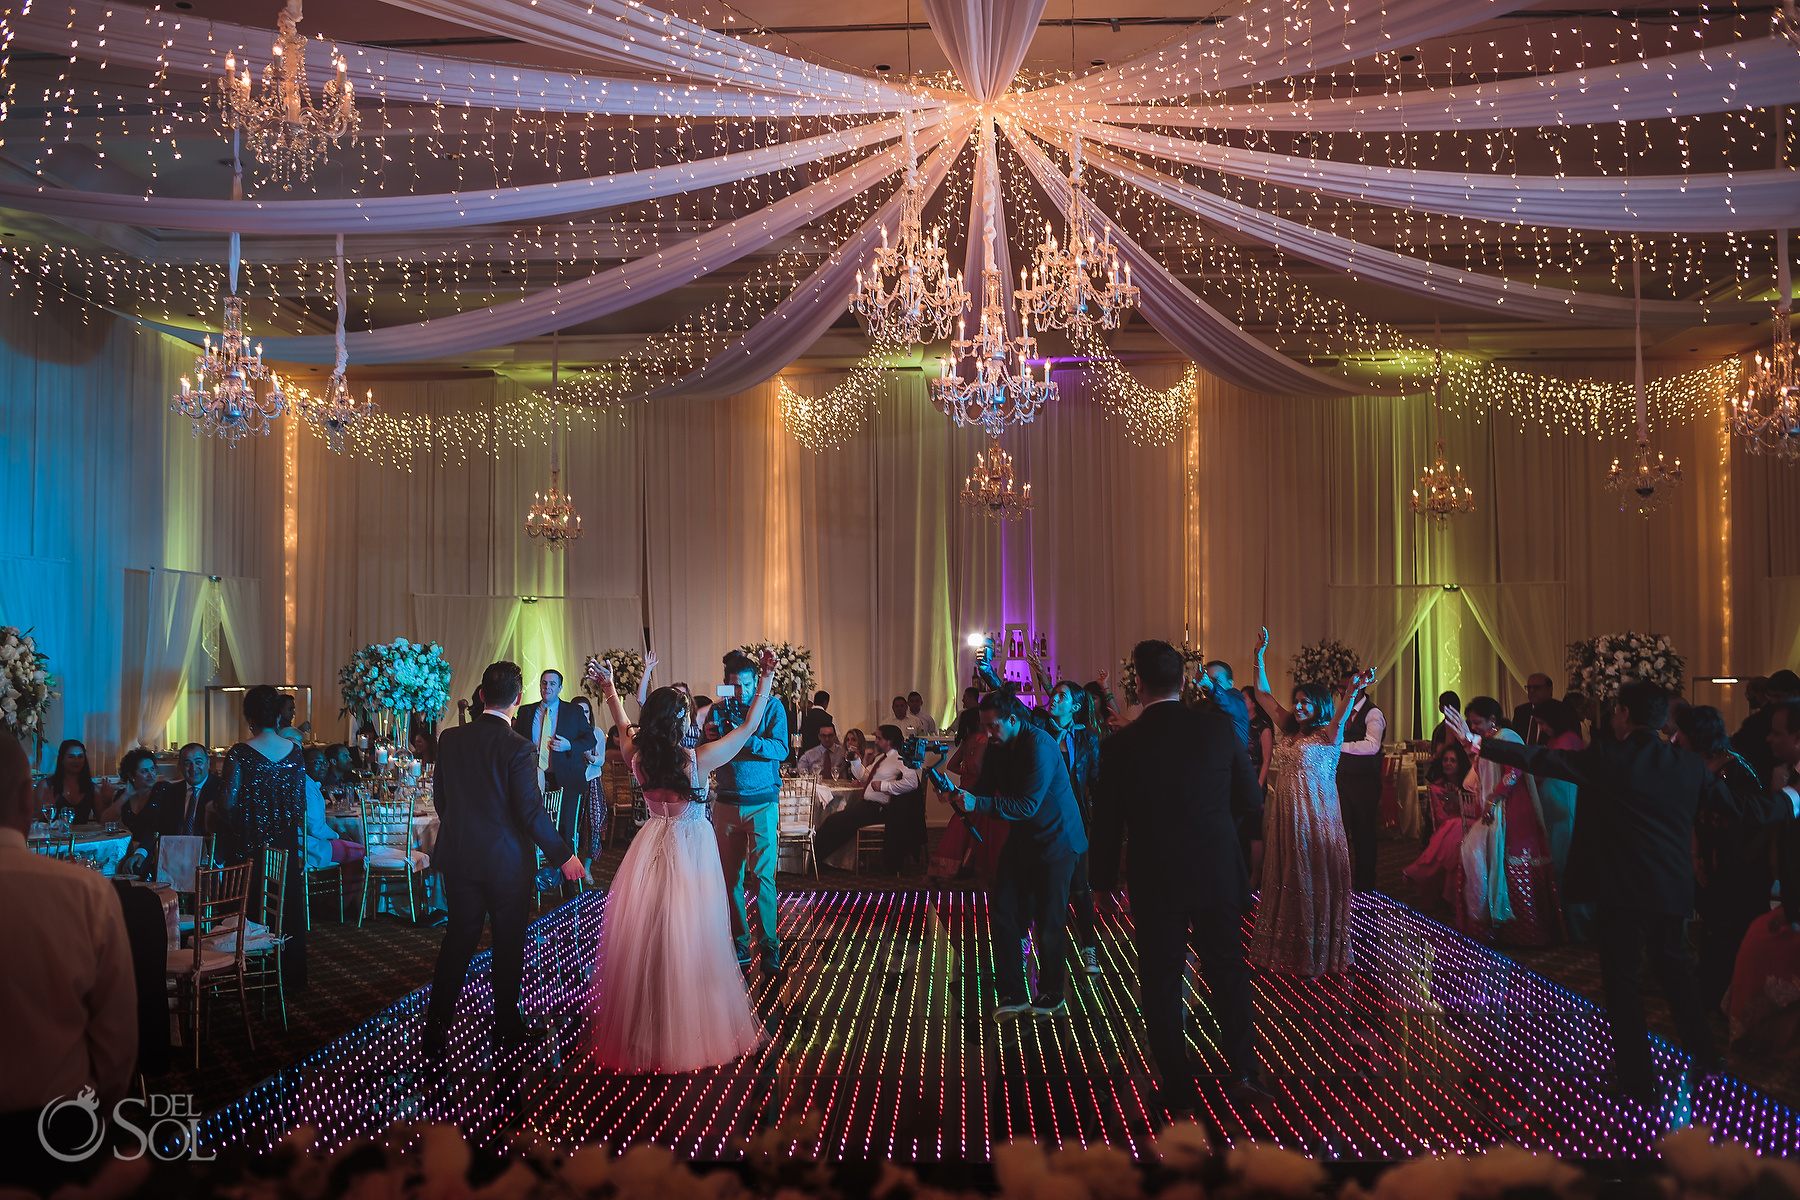 Massive chandelier decoration Dance Floor Tulum Jewish Wedding Reception